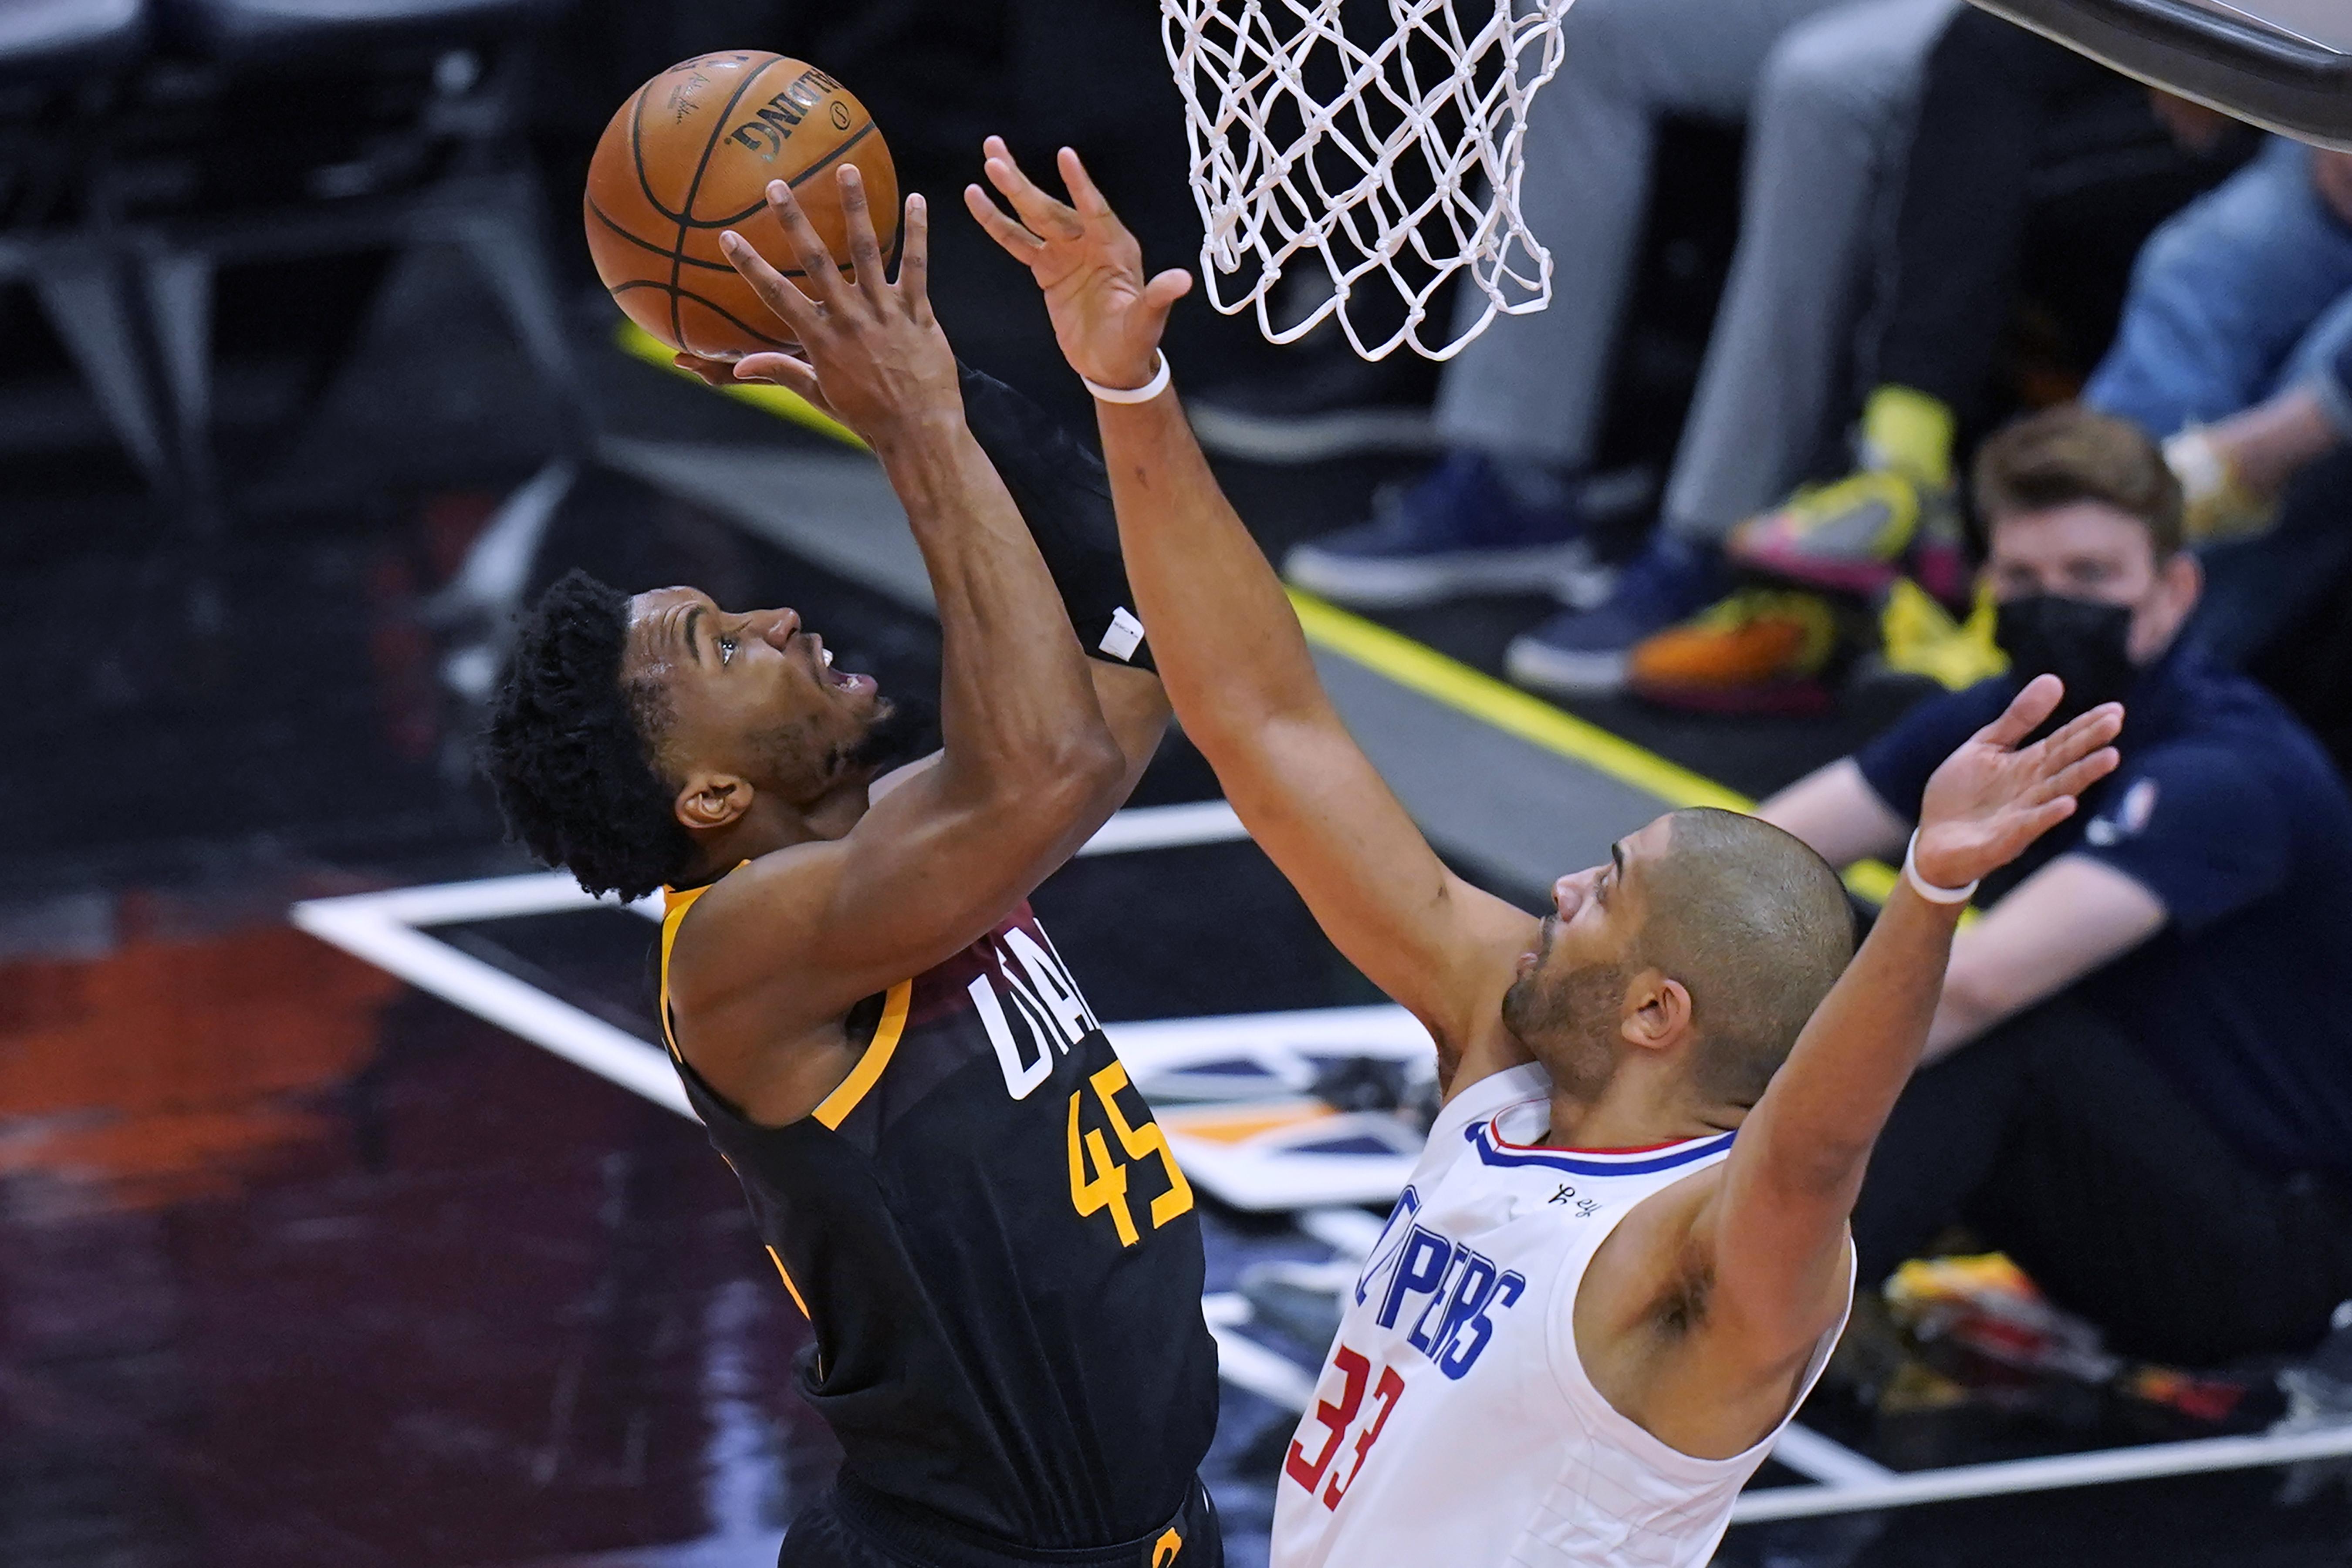 <p>Donovan Mitchell Drops 37, Lifts Jazz to 2-0 Lead vs. Kawhi Leonard, Clippers thumbnail